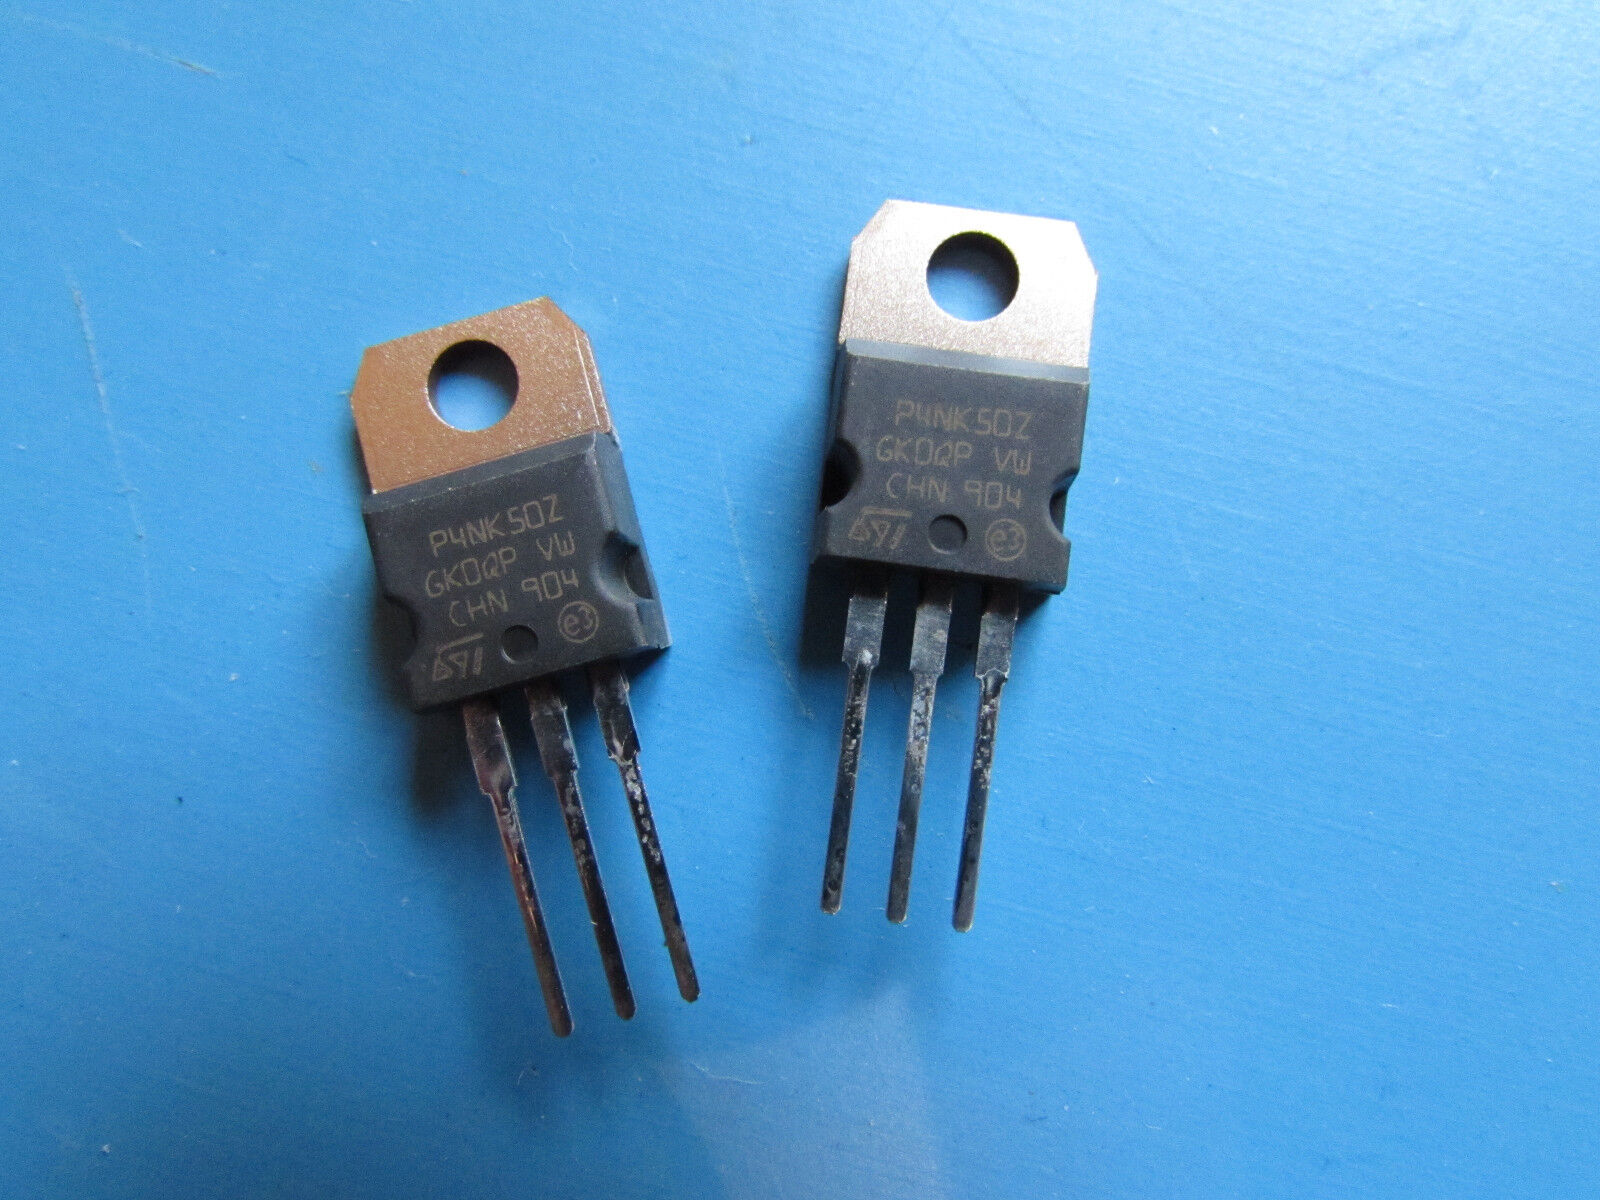 100 SMD Widerstand 1,1KOhm RC0805 1//8W chip resistors 0805 1,1K 0,125W 1/% 076975